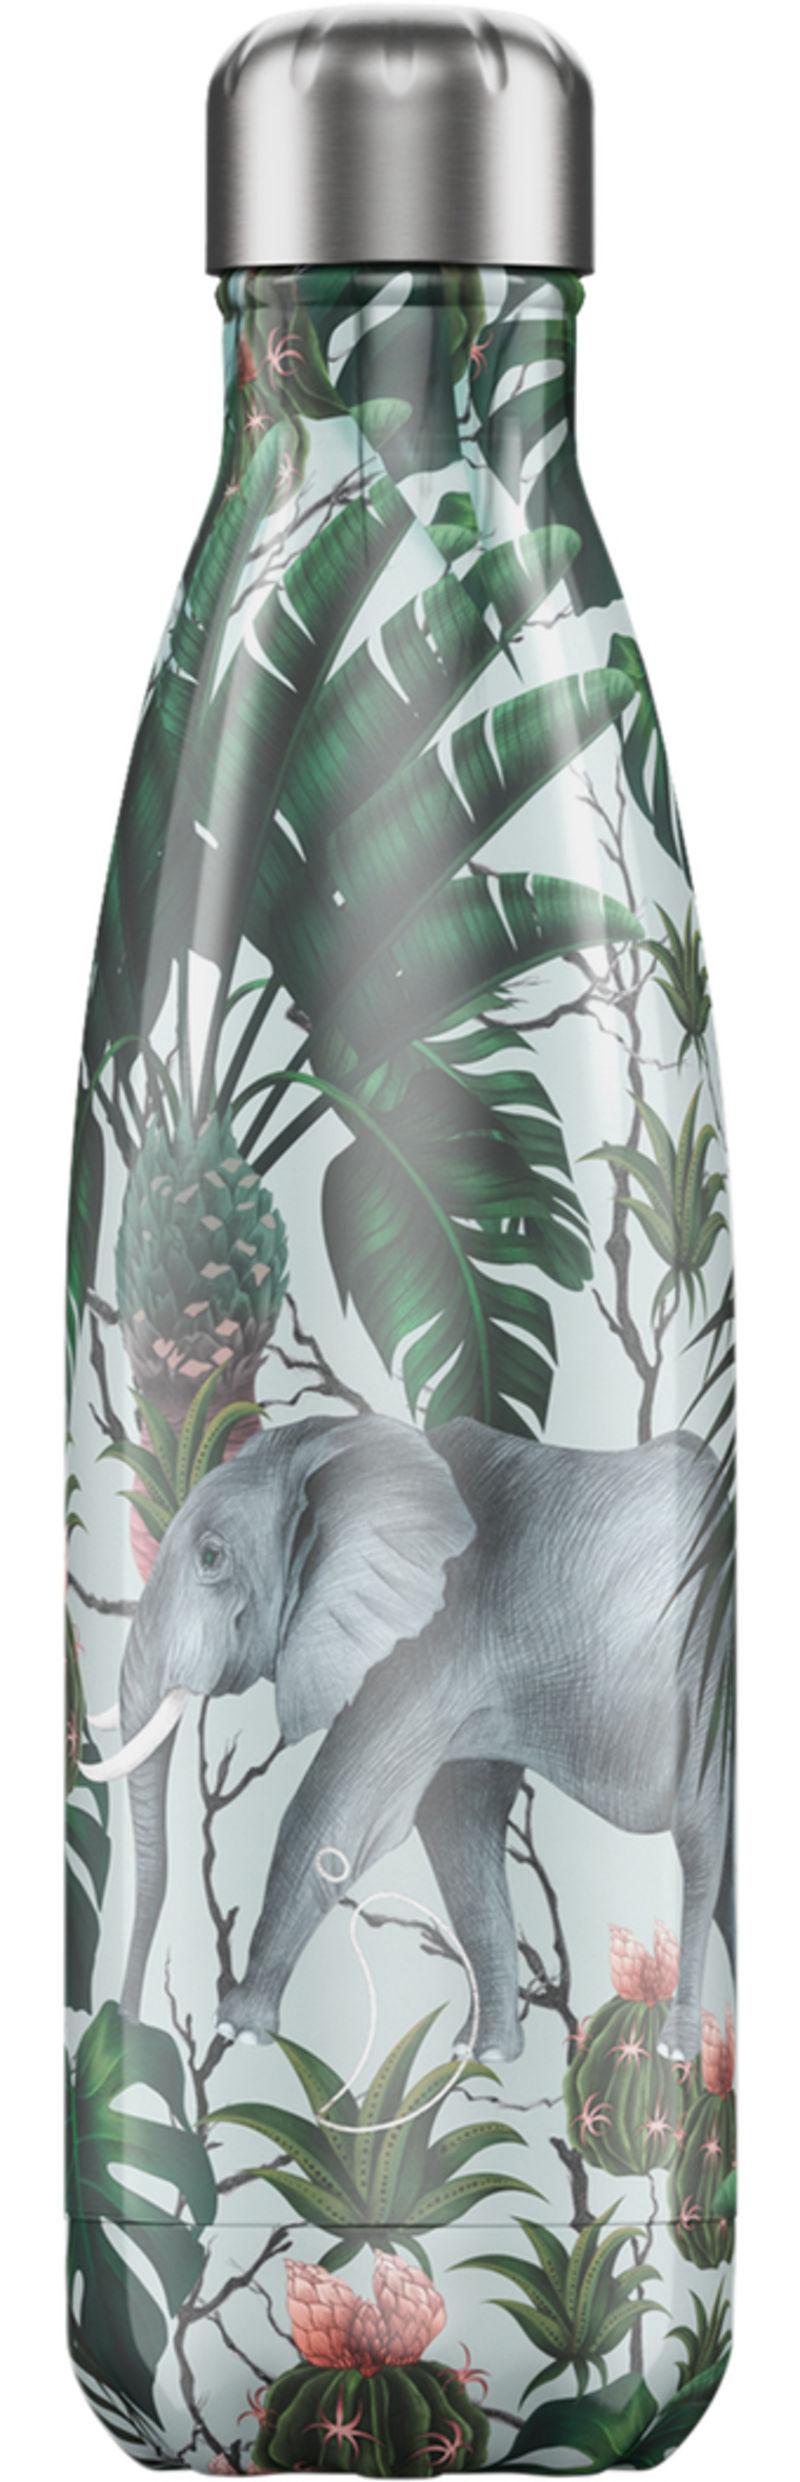 Botella Inox Elefante 750ml -